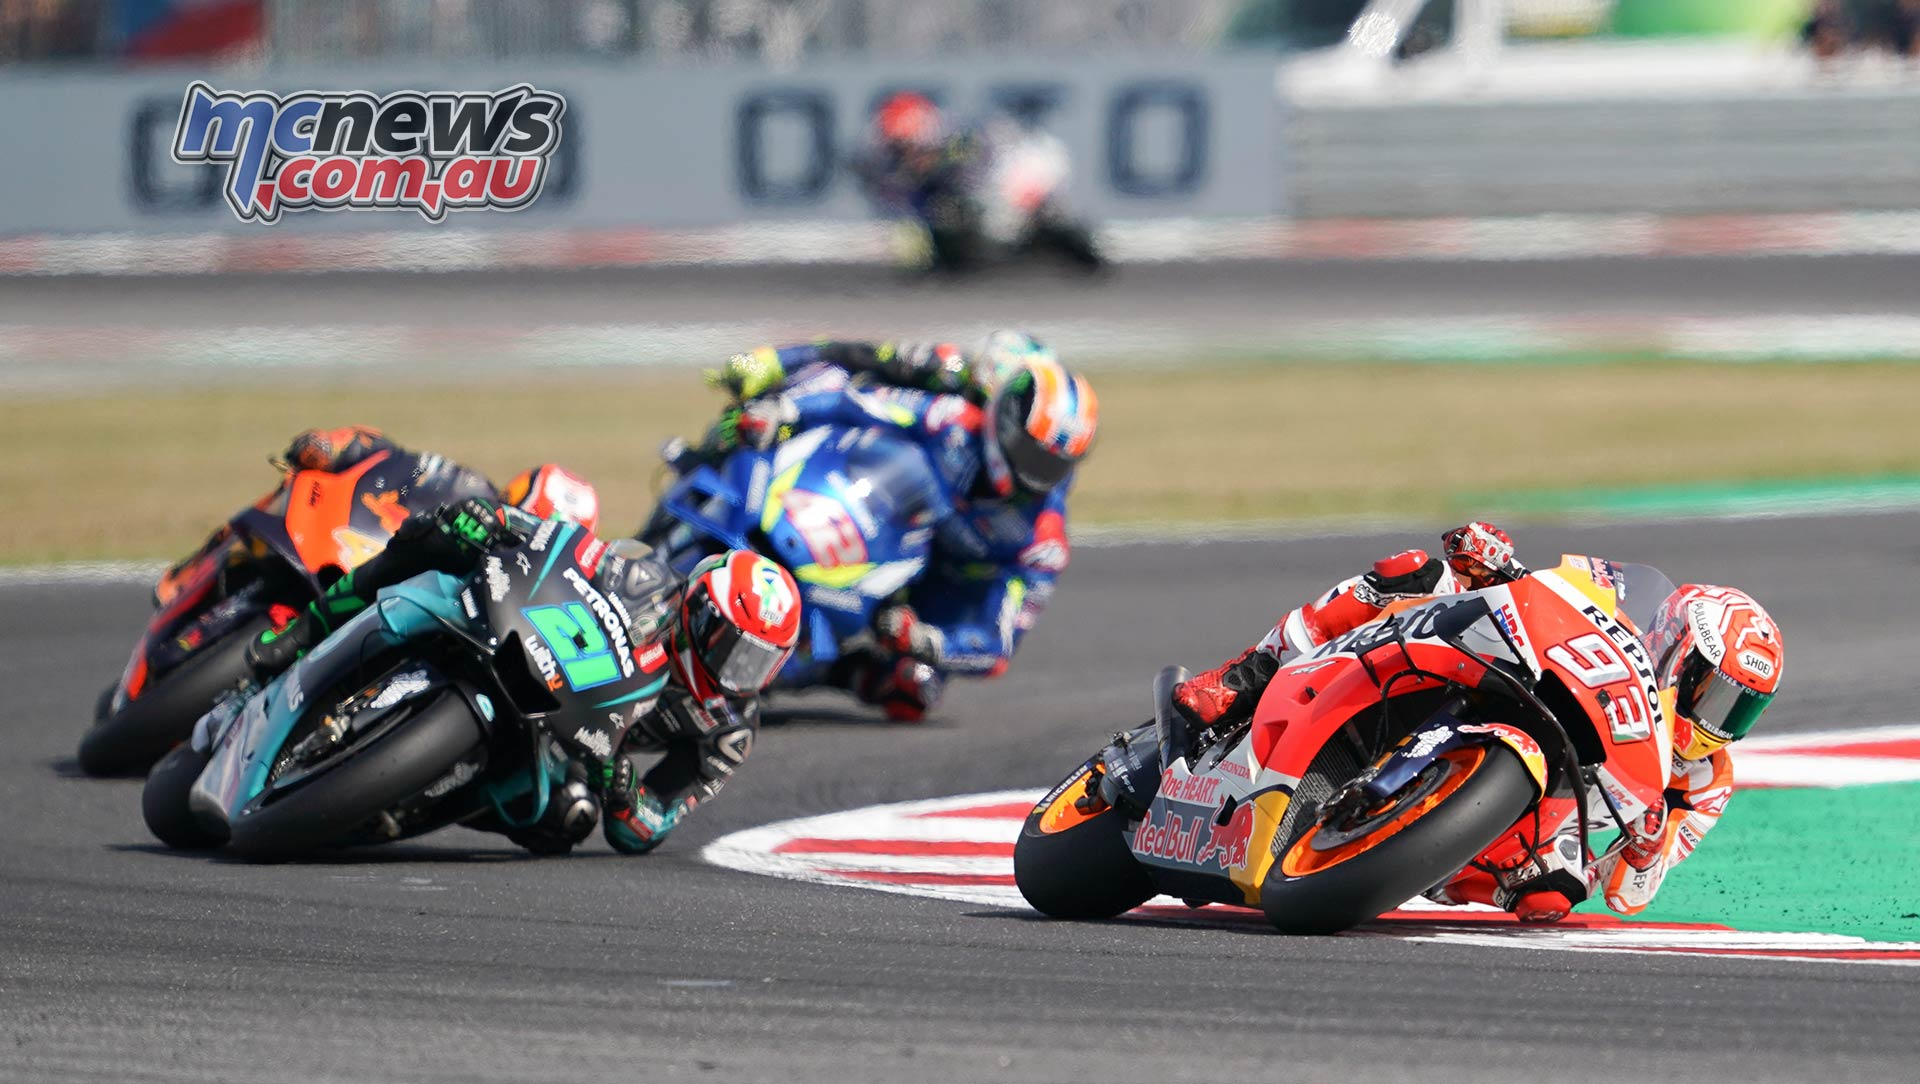 MotoGP Rnd Misano Marquez Morbidelli